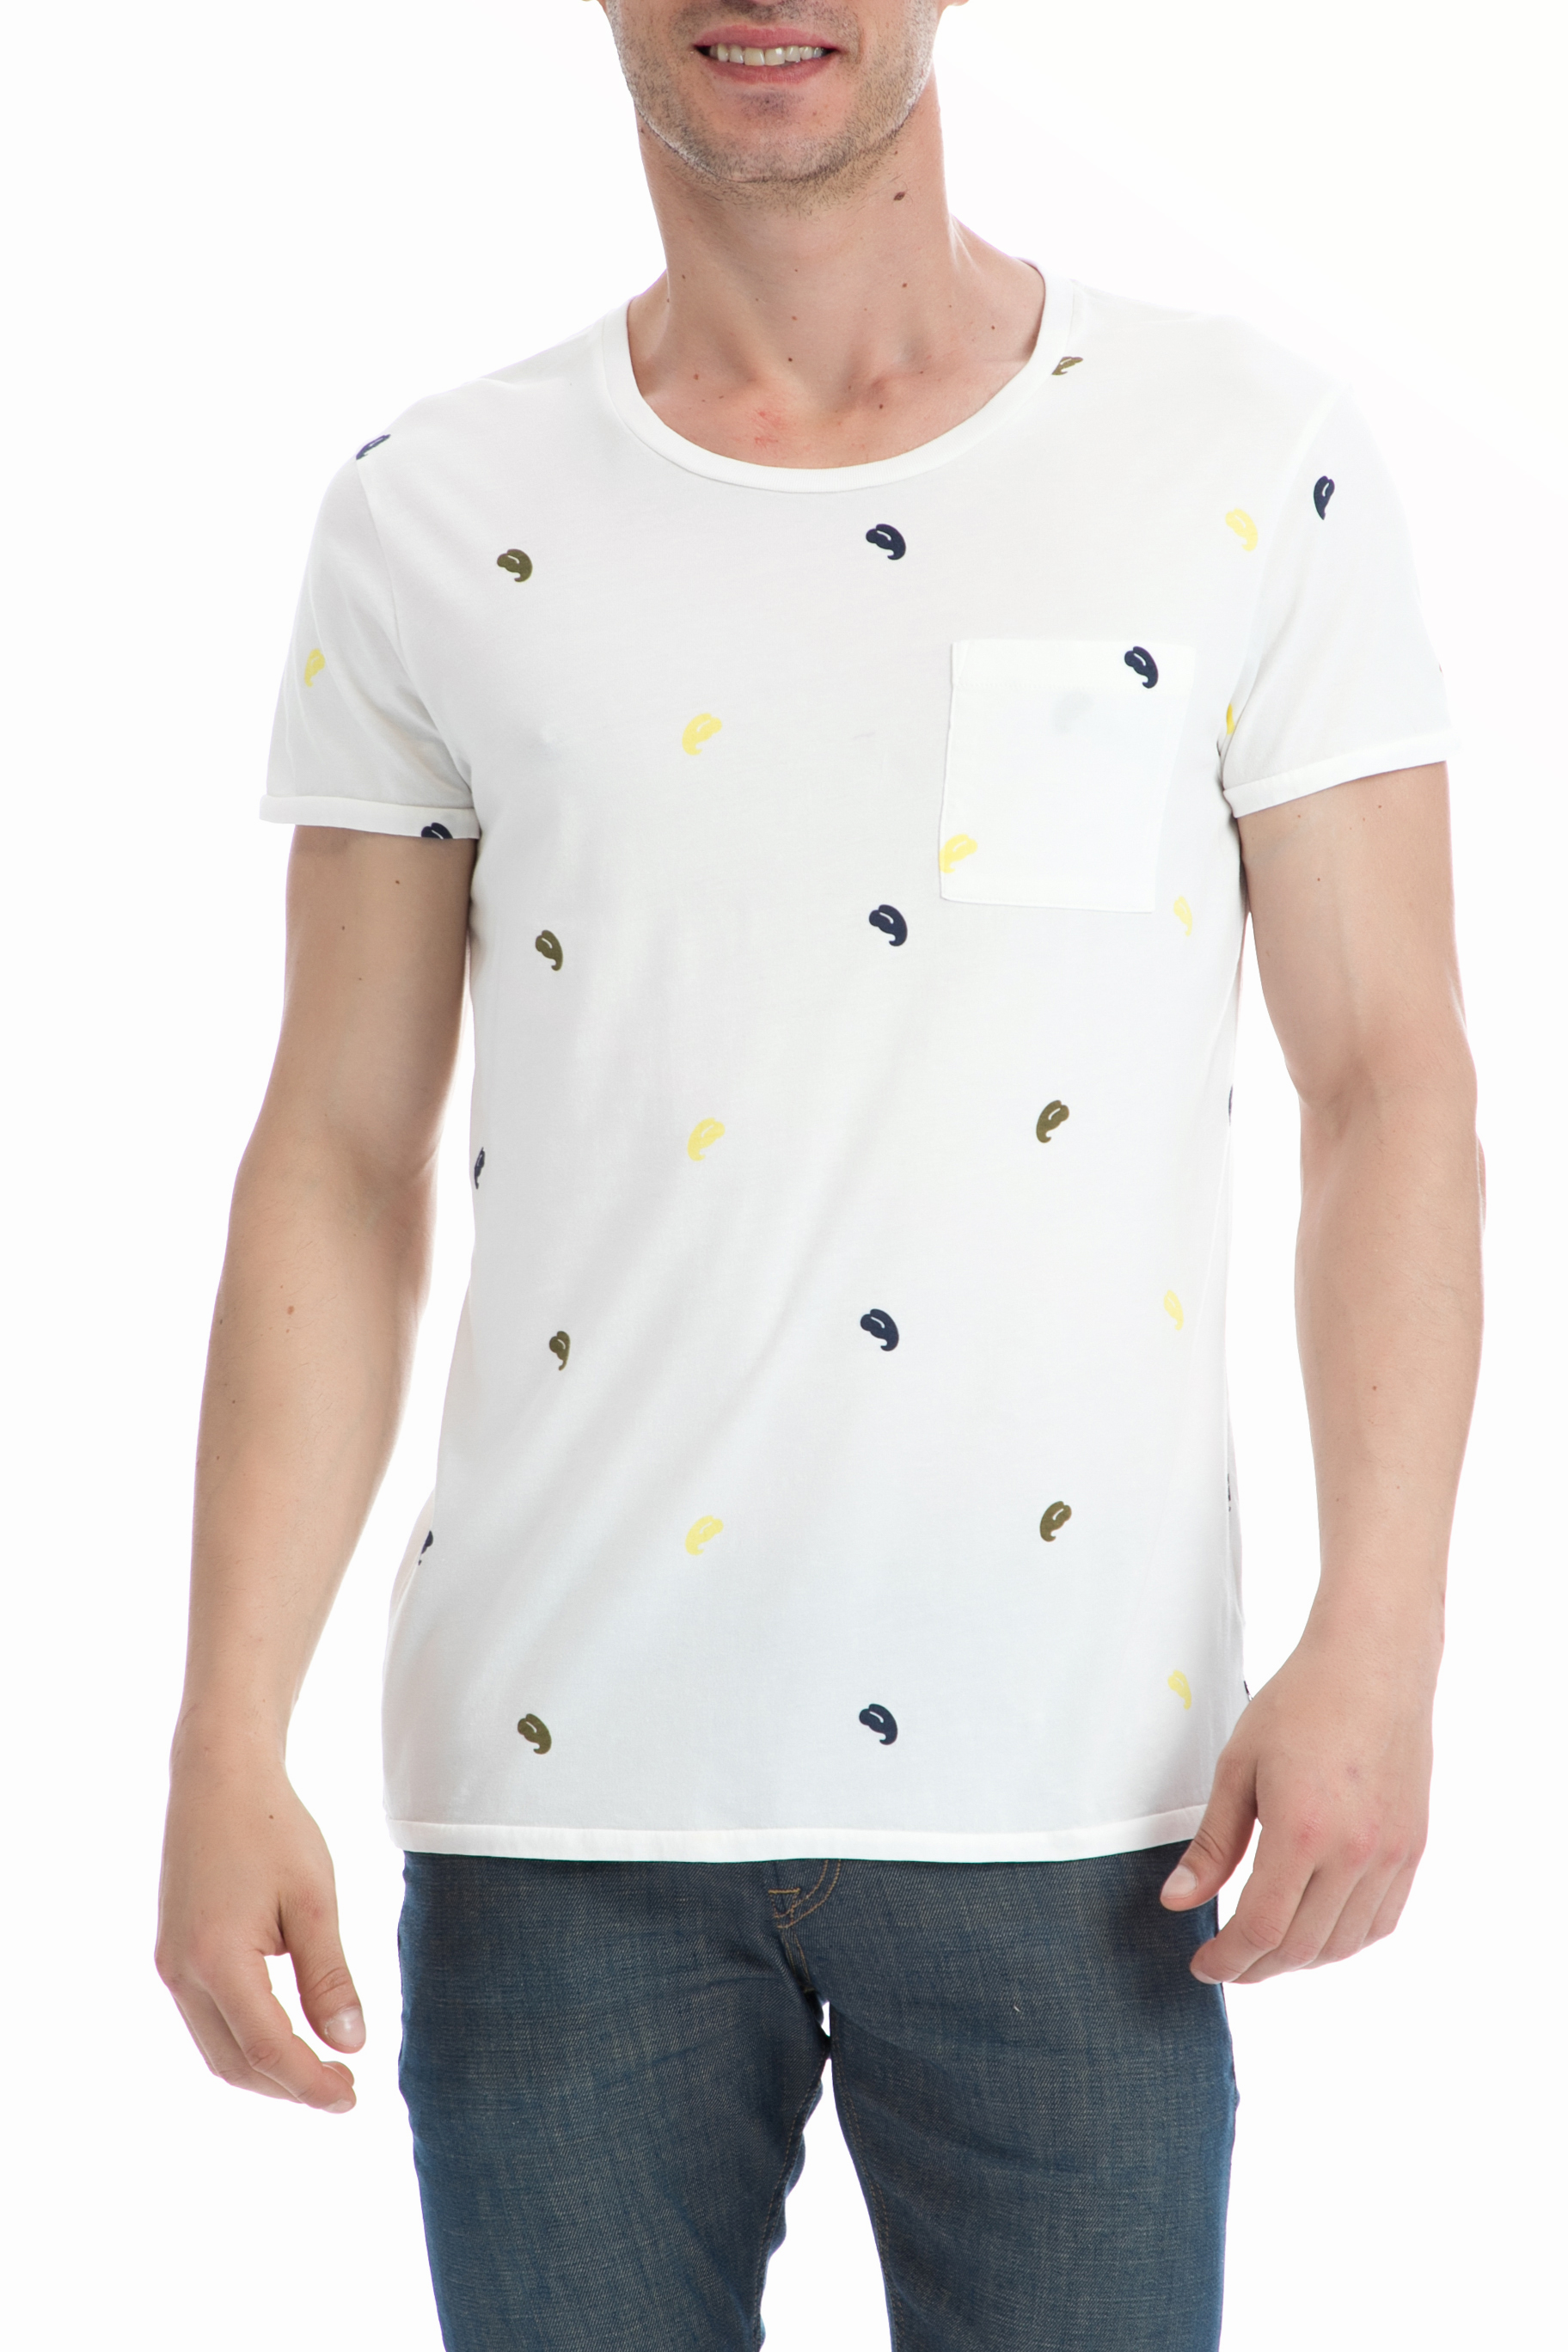 SCOTCH & SODA - Ανδρική μπλούζα SCOTCH & SODA λευκή ανδρικά ρούχα μπλούζες κοντομάνικες